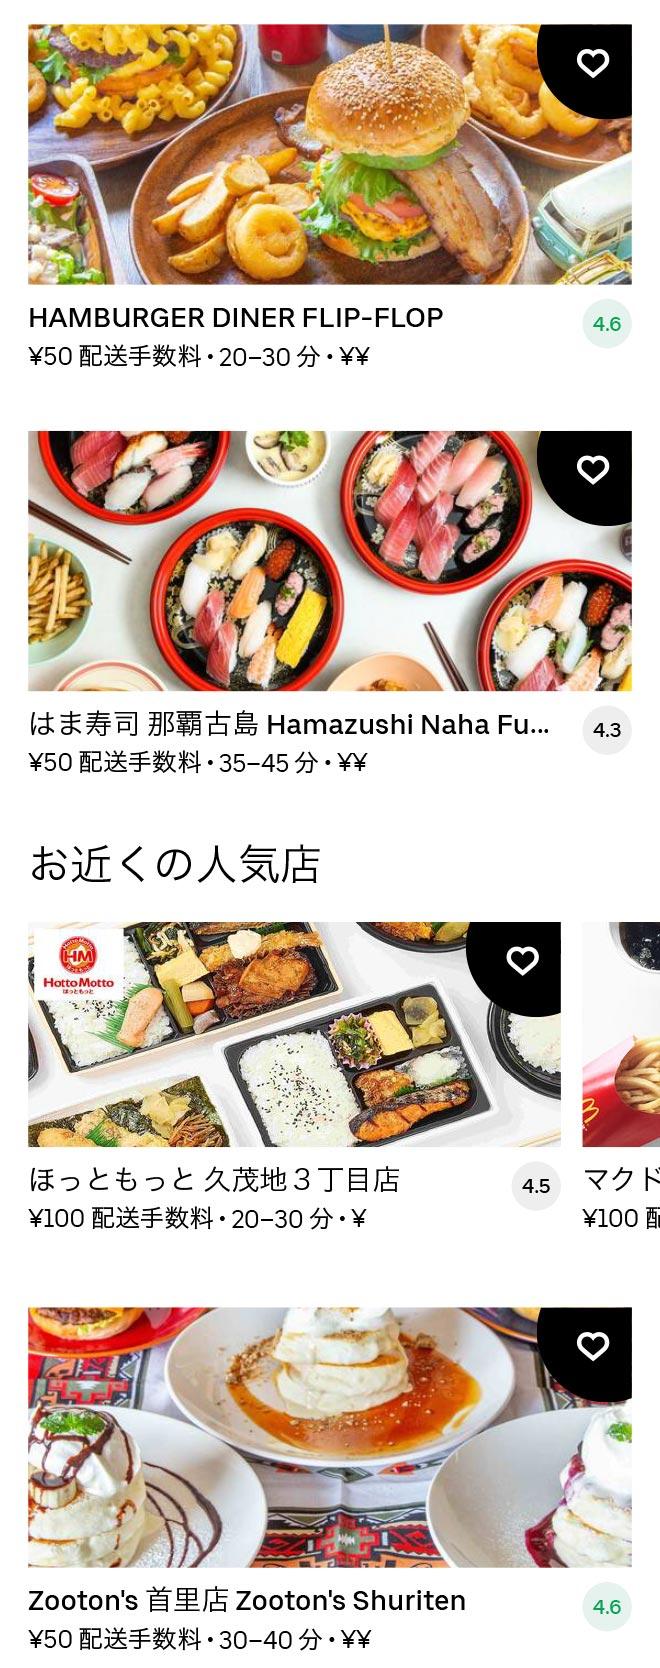 Omoromachi menu 2011 08